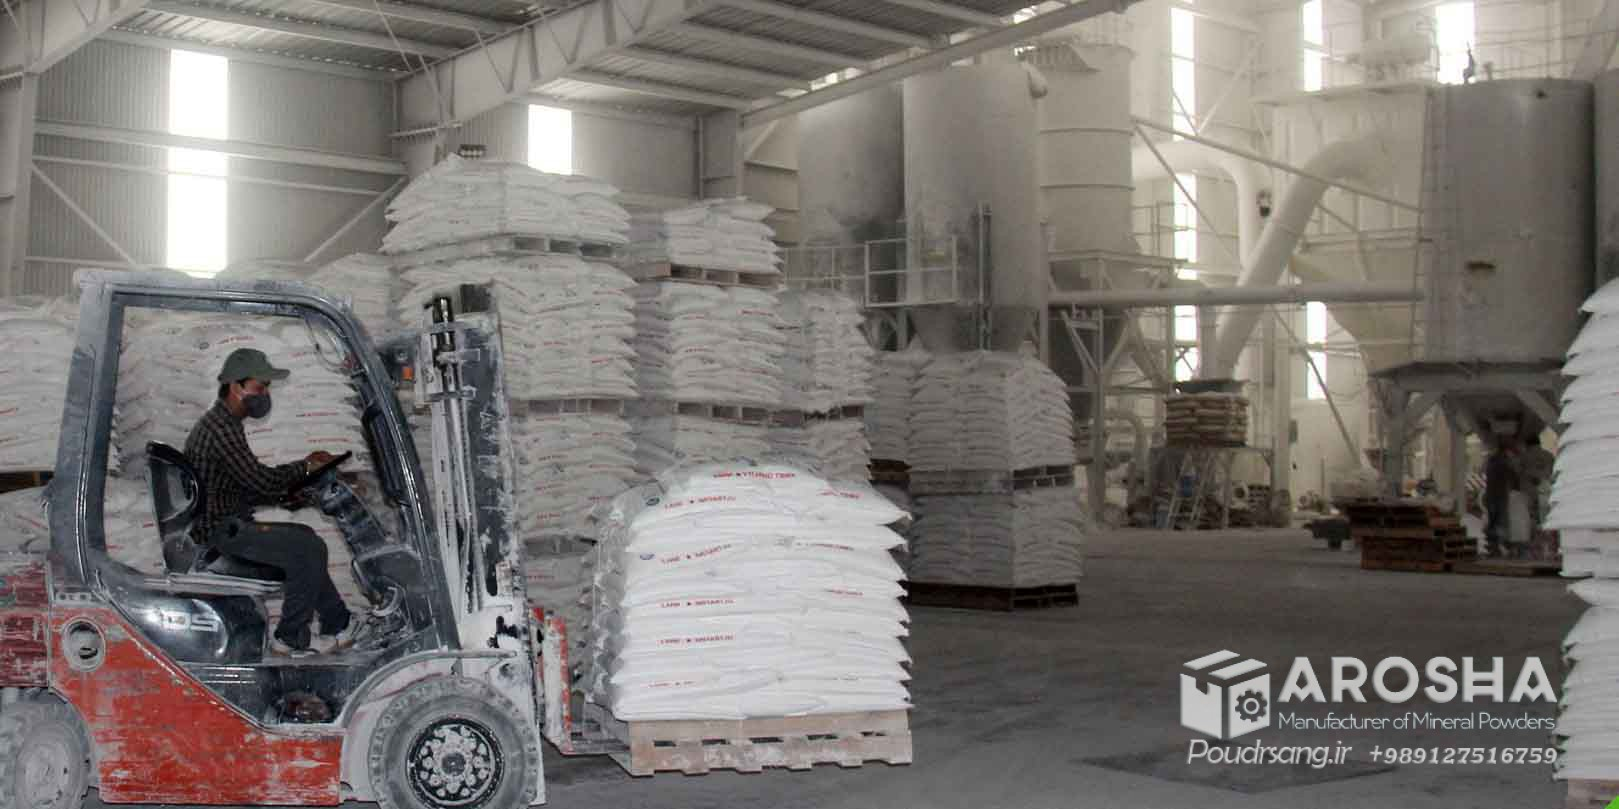 مرکز تولید و فروش کربنات کلسیم کوتد